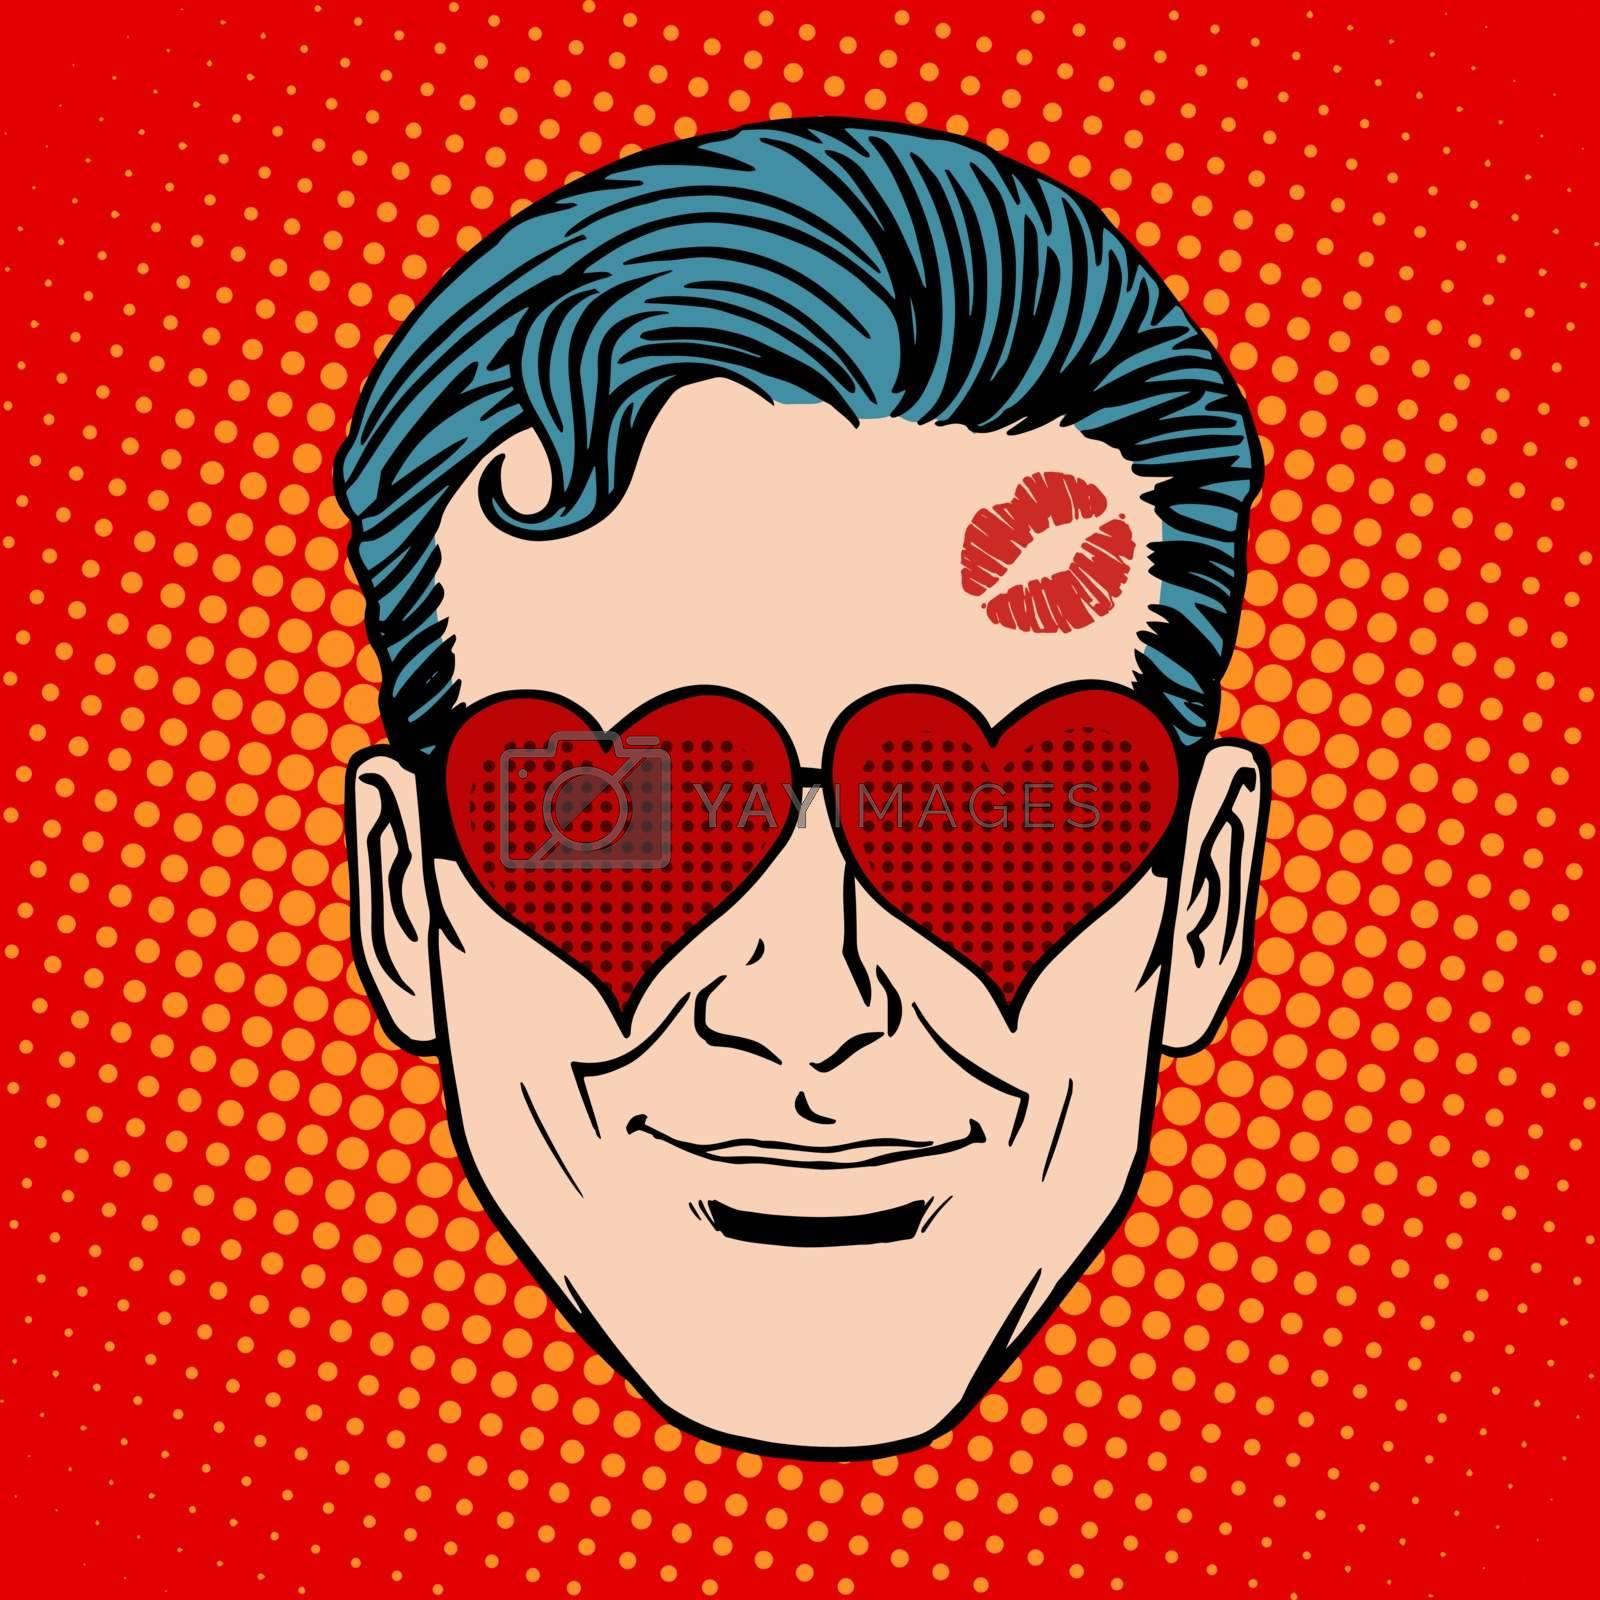 Retro Emoji lover man face pop art style. Heart love romantic relationship kiss